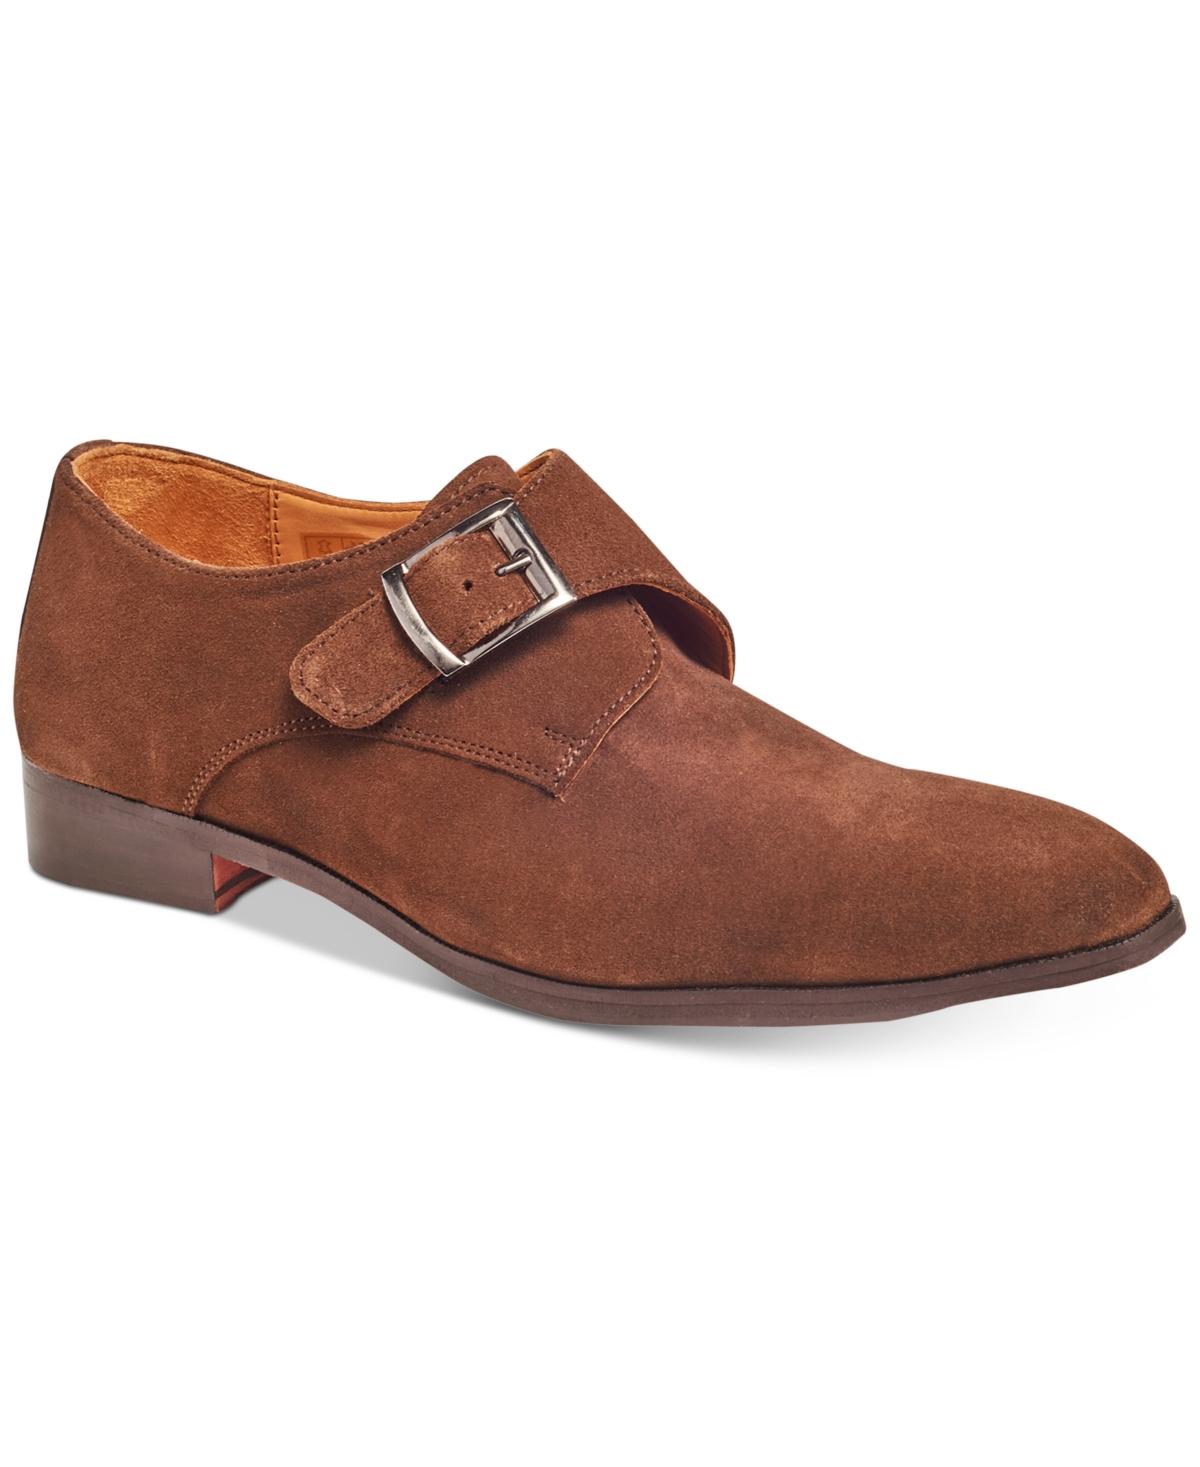 Carlos by Carlos Santana Men's Freedom Single Monk-Strap Suede Loafers Men's Shoes